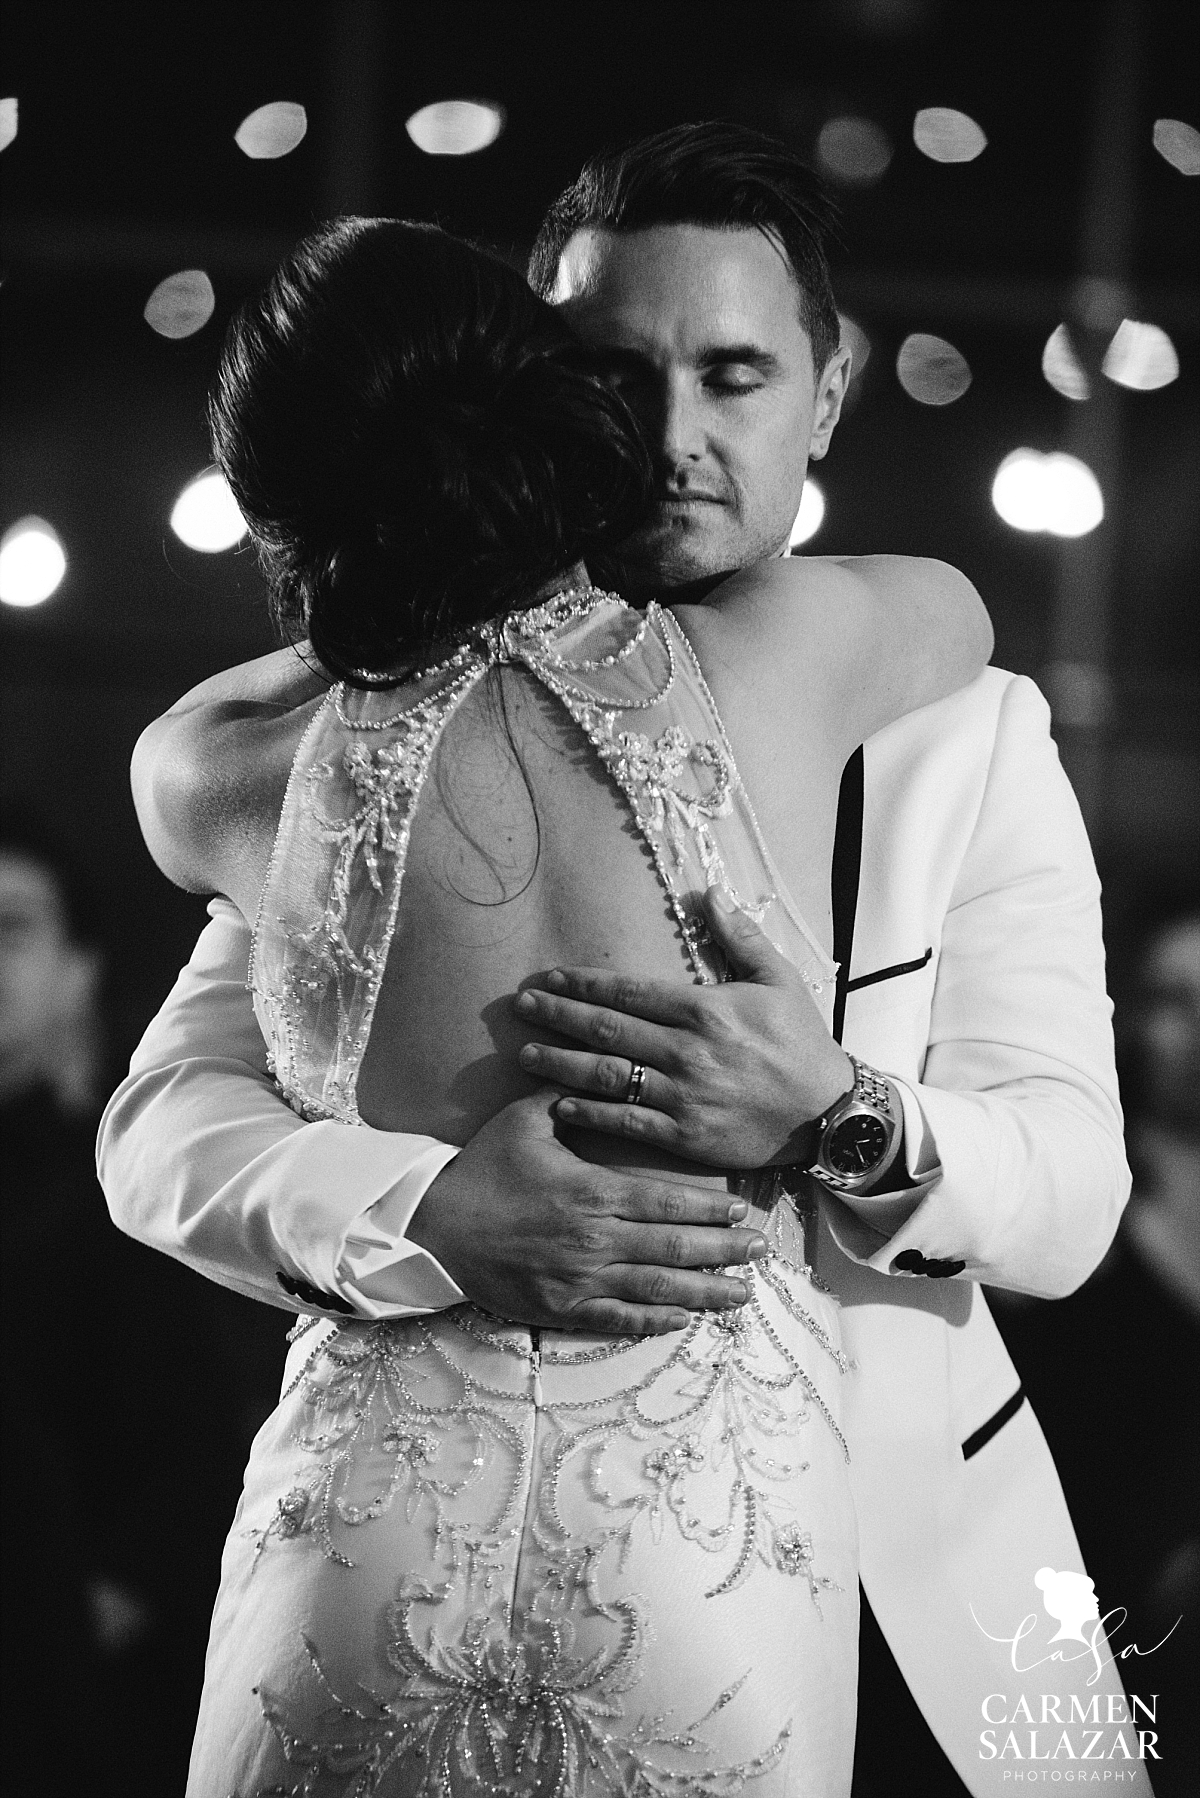 Romantic first dance of vintage bride and groom - Carmen Salazar